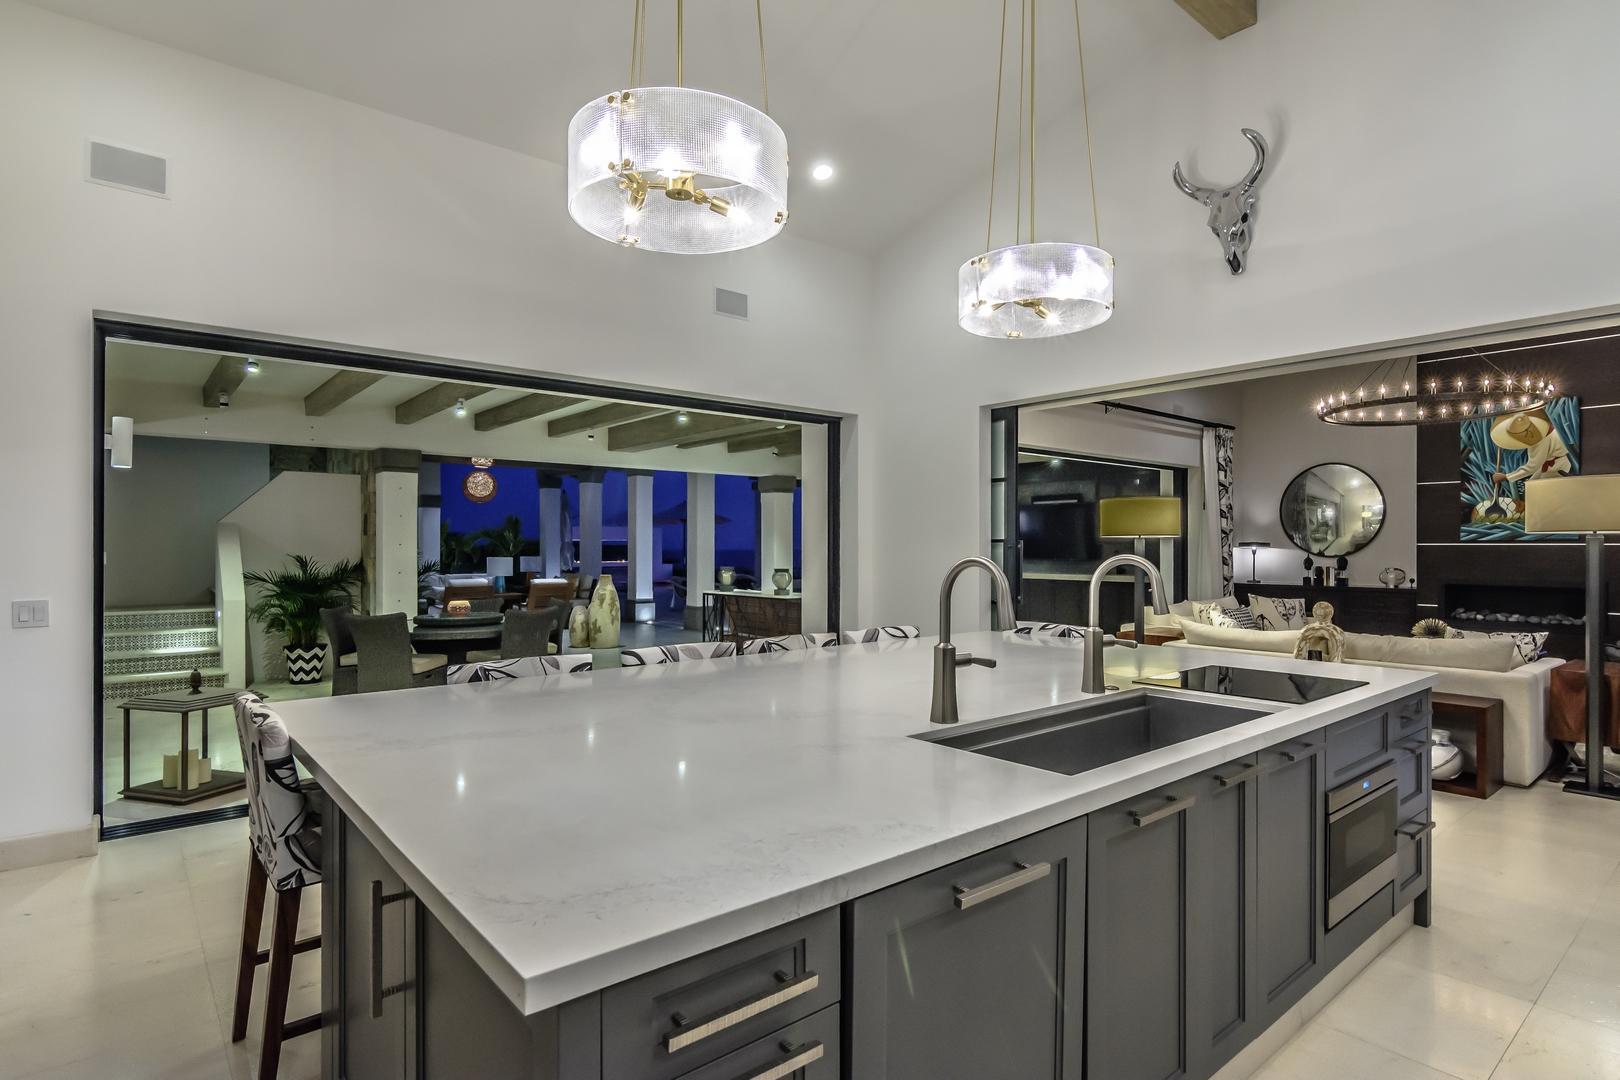 San Jose del Cabo, 5 Bedrooms Bedrooms, ,5 BathroomsBathrooms,House,For Sale,Avenida Padre Kino,19-579